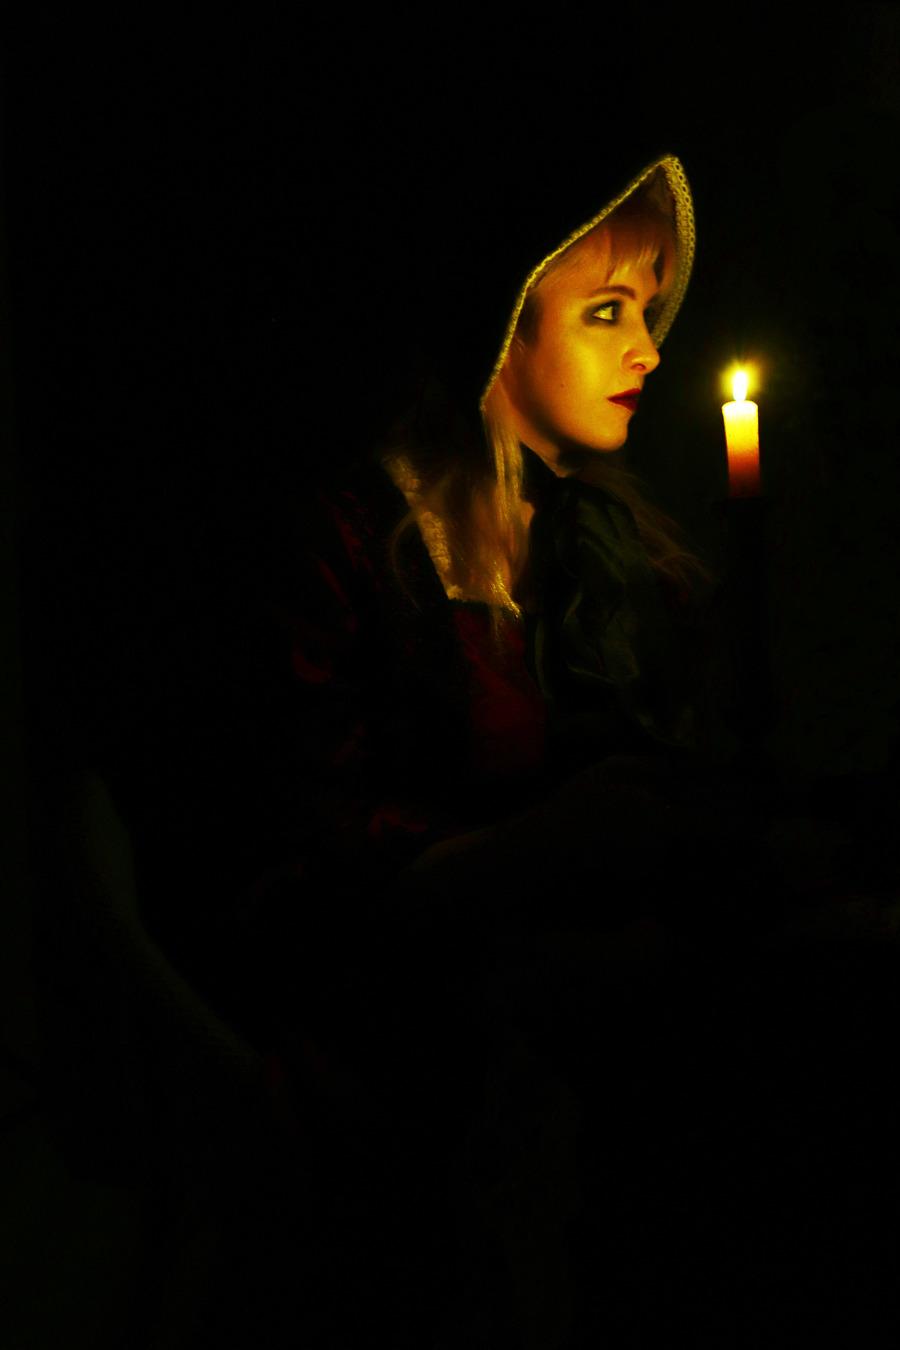 Lurking in the shadows. / Photography by Toby doddridge, Model Maretta Vergette, Taken at Butterfly Studios Norwich / Uploaded 8th July 2019 @ 07:13 PM